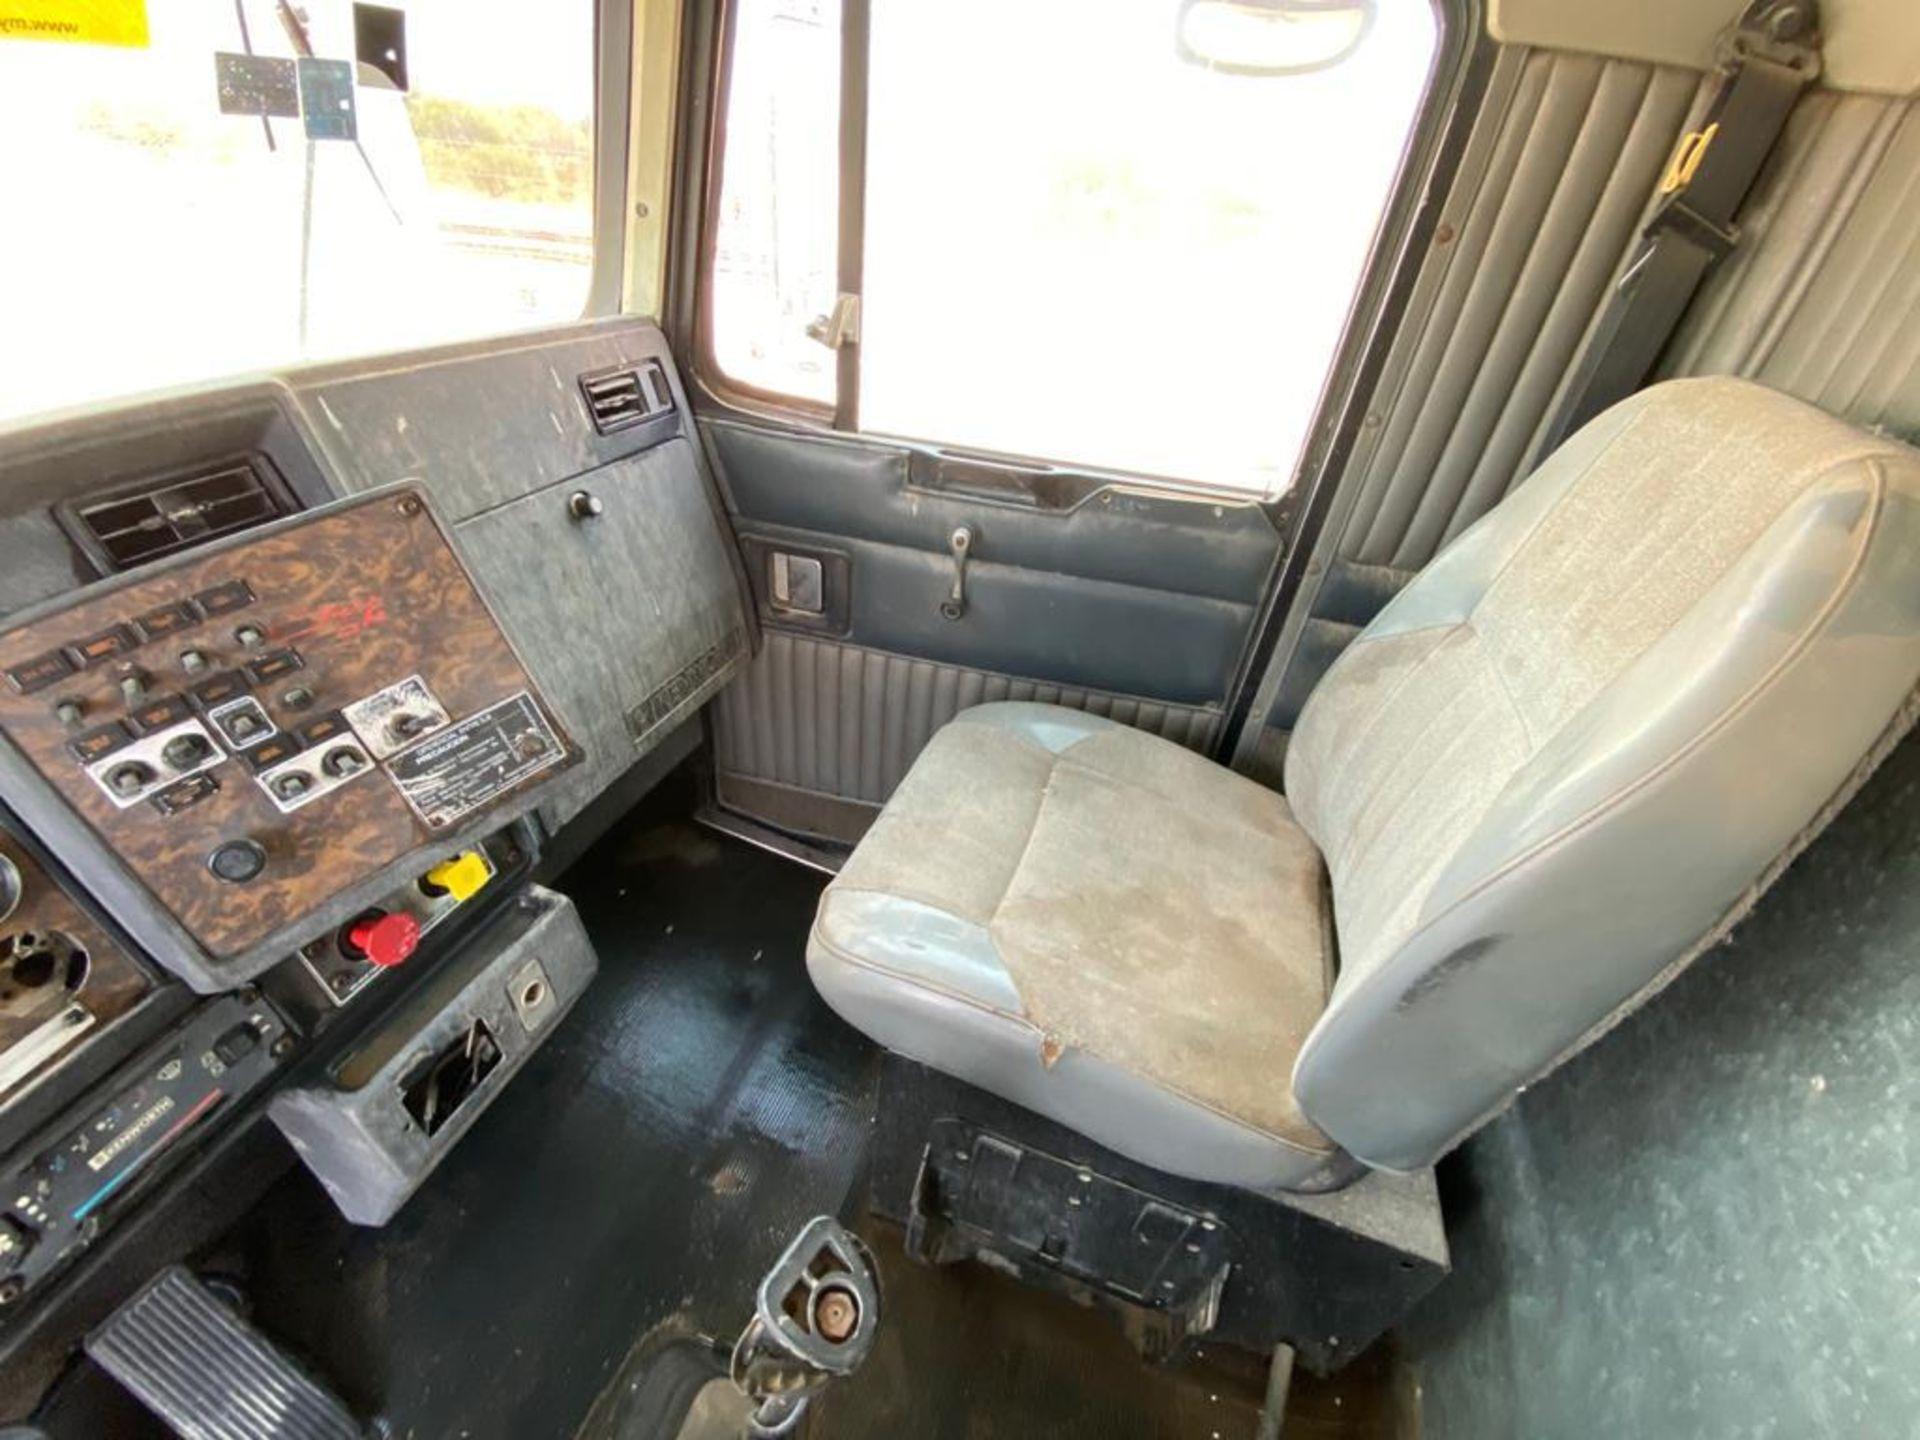 1998 Kenworth 5000 Gallon, standard transmission of 16 speeds - Image 26 of 68